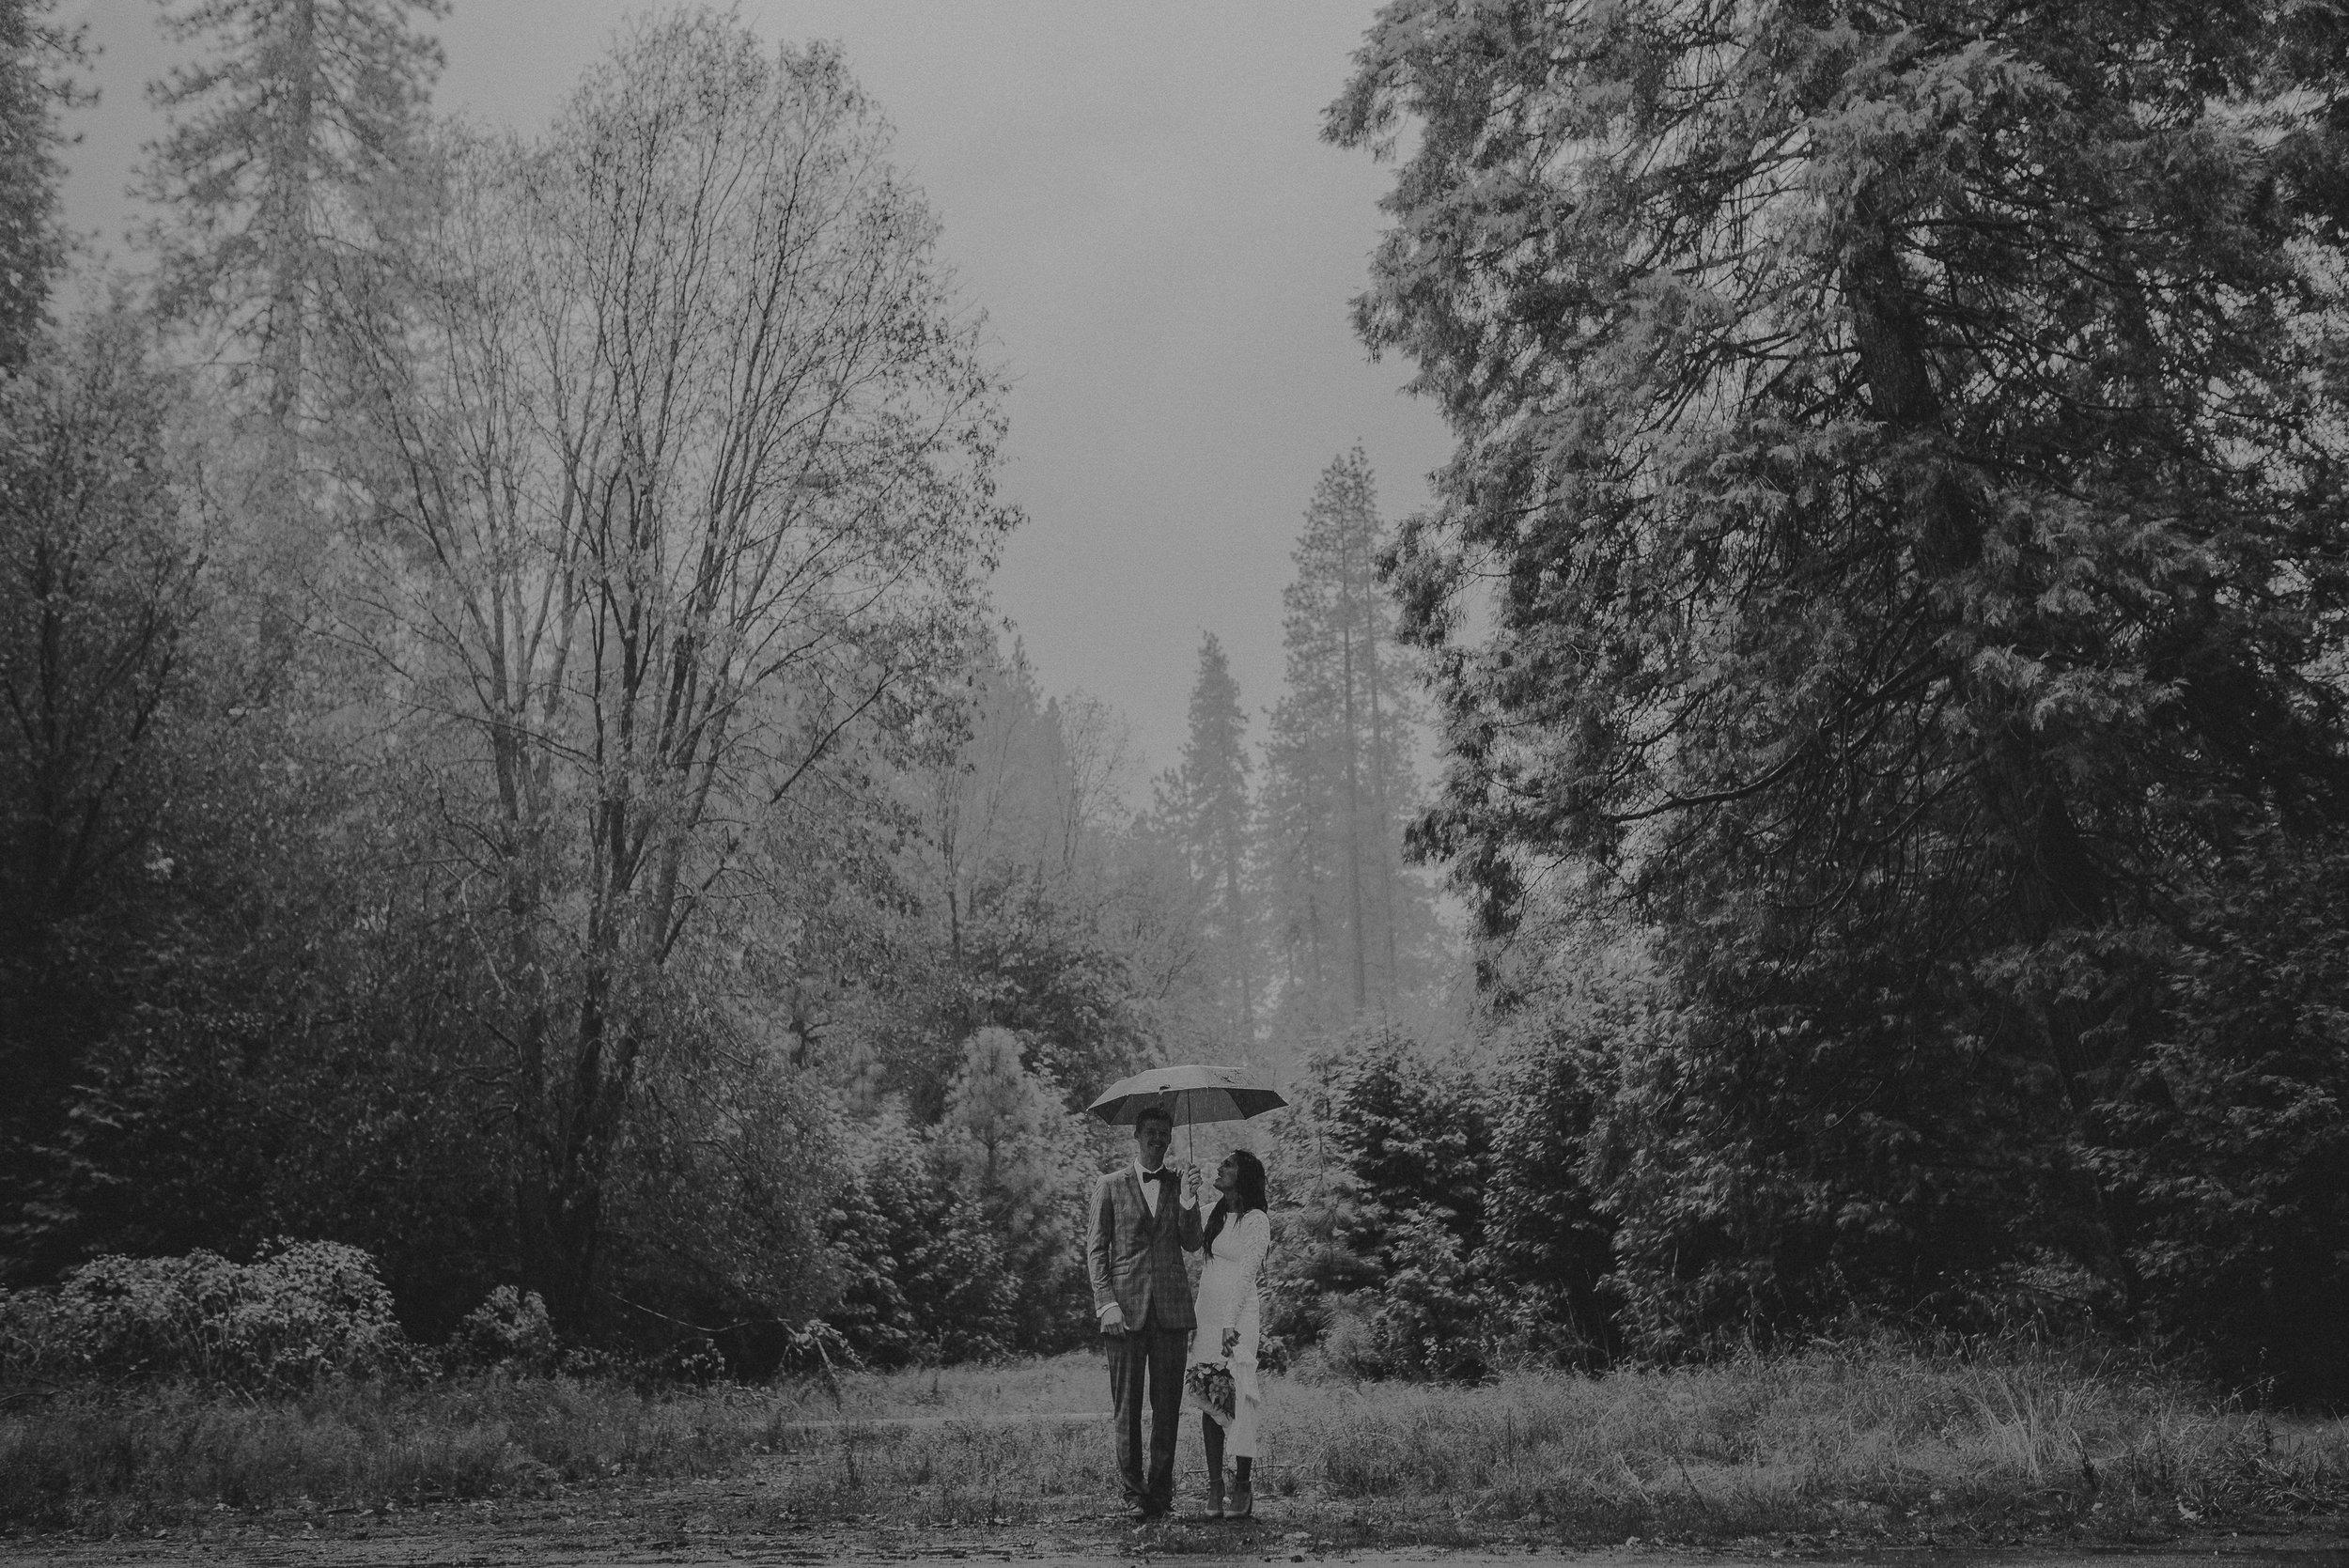 Isaiah + Taylor Photography - Yosemite Elopement - Los Angeles Wedding Photographer-20.jpg